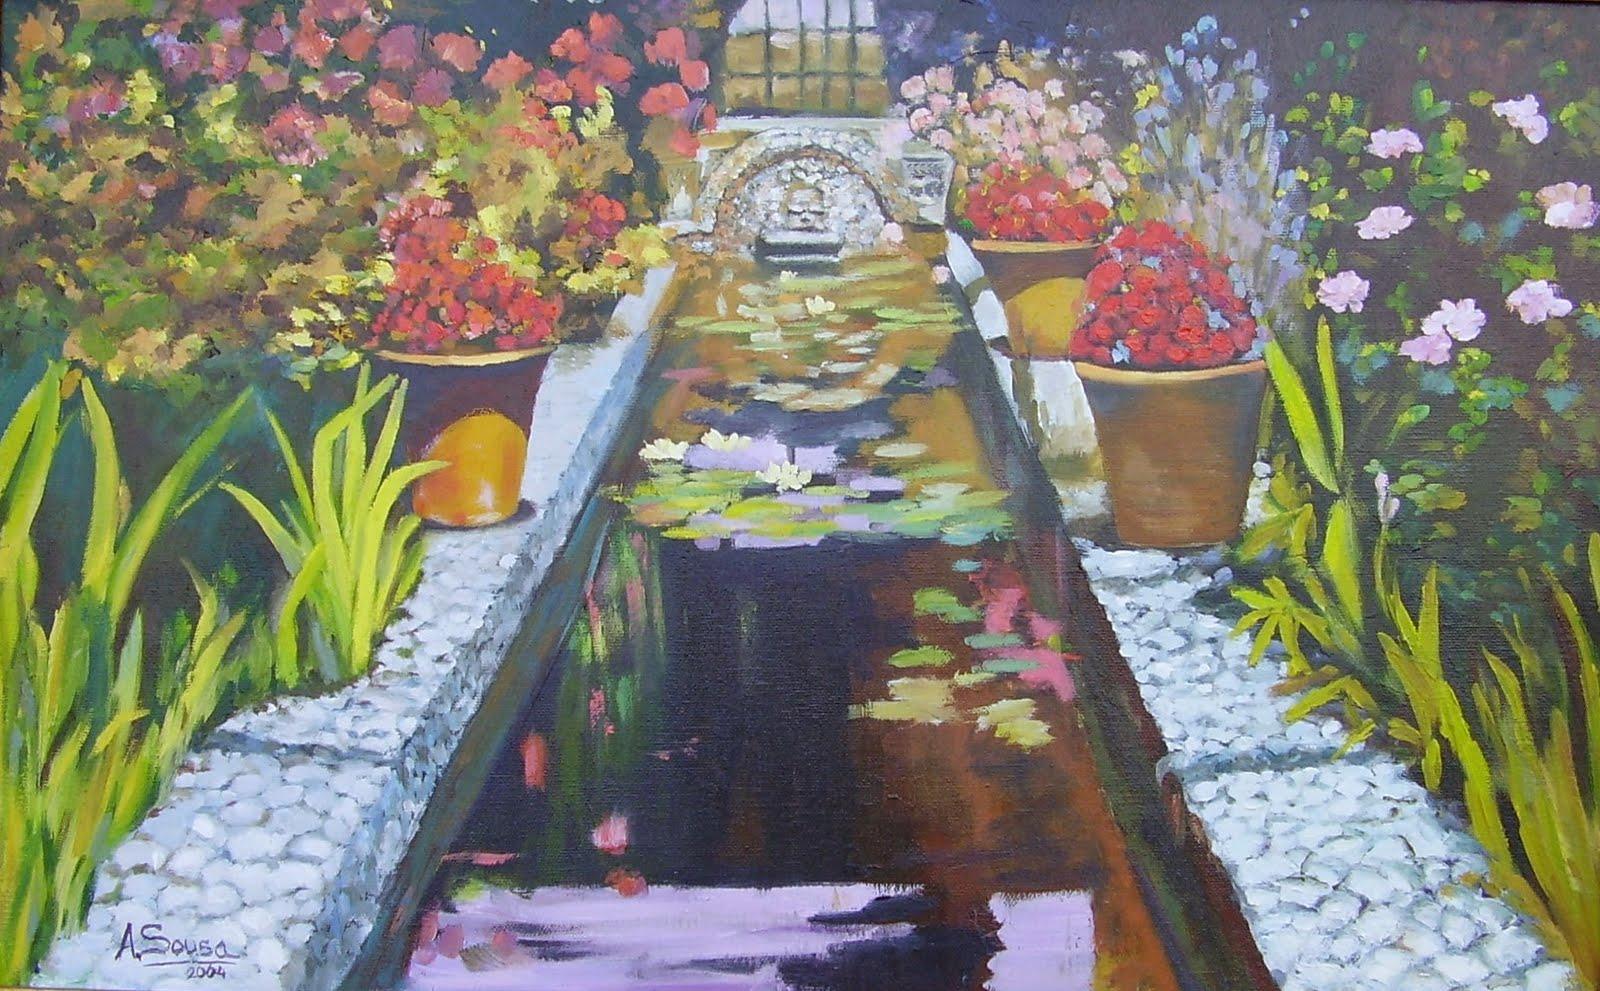 Pinturas de sousa estanque de jard n for Pintura para estanques